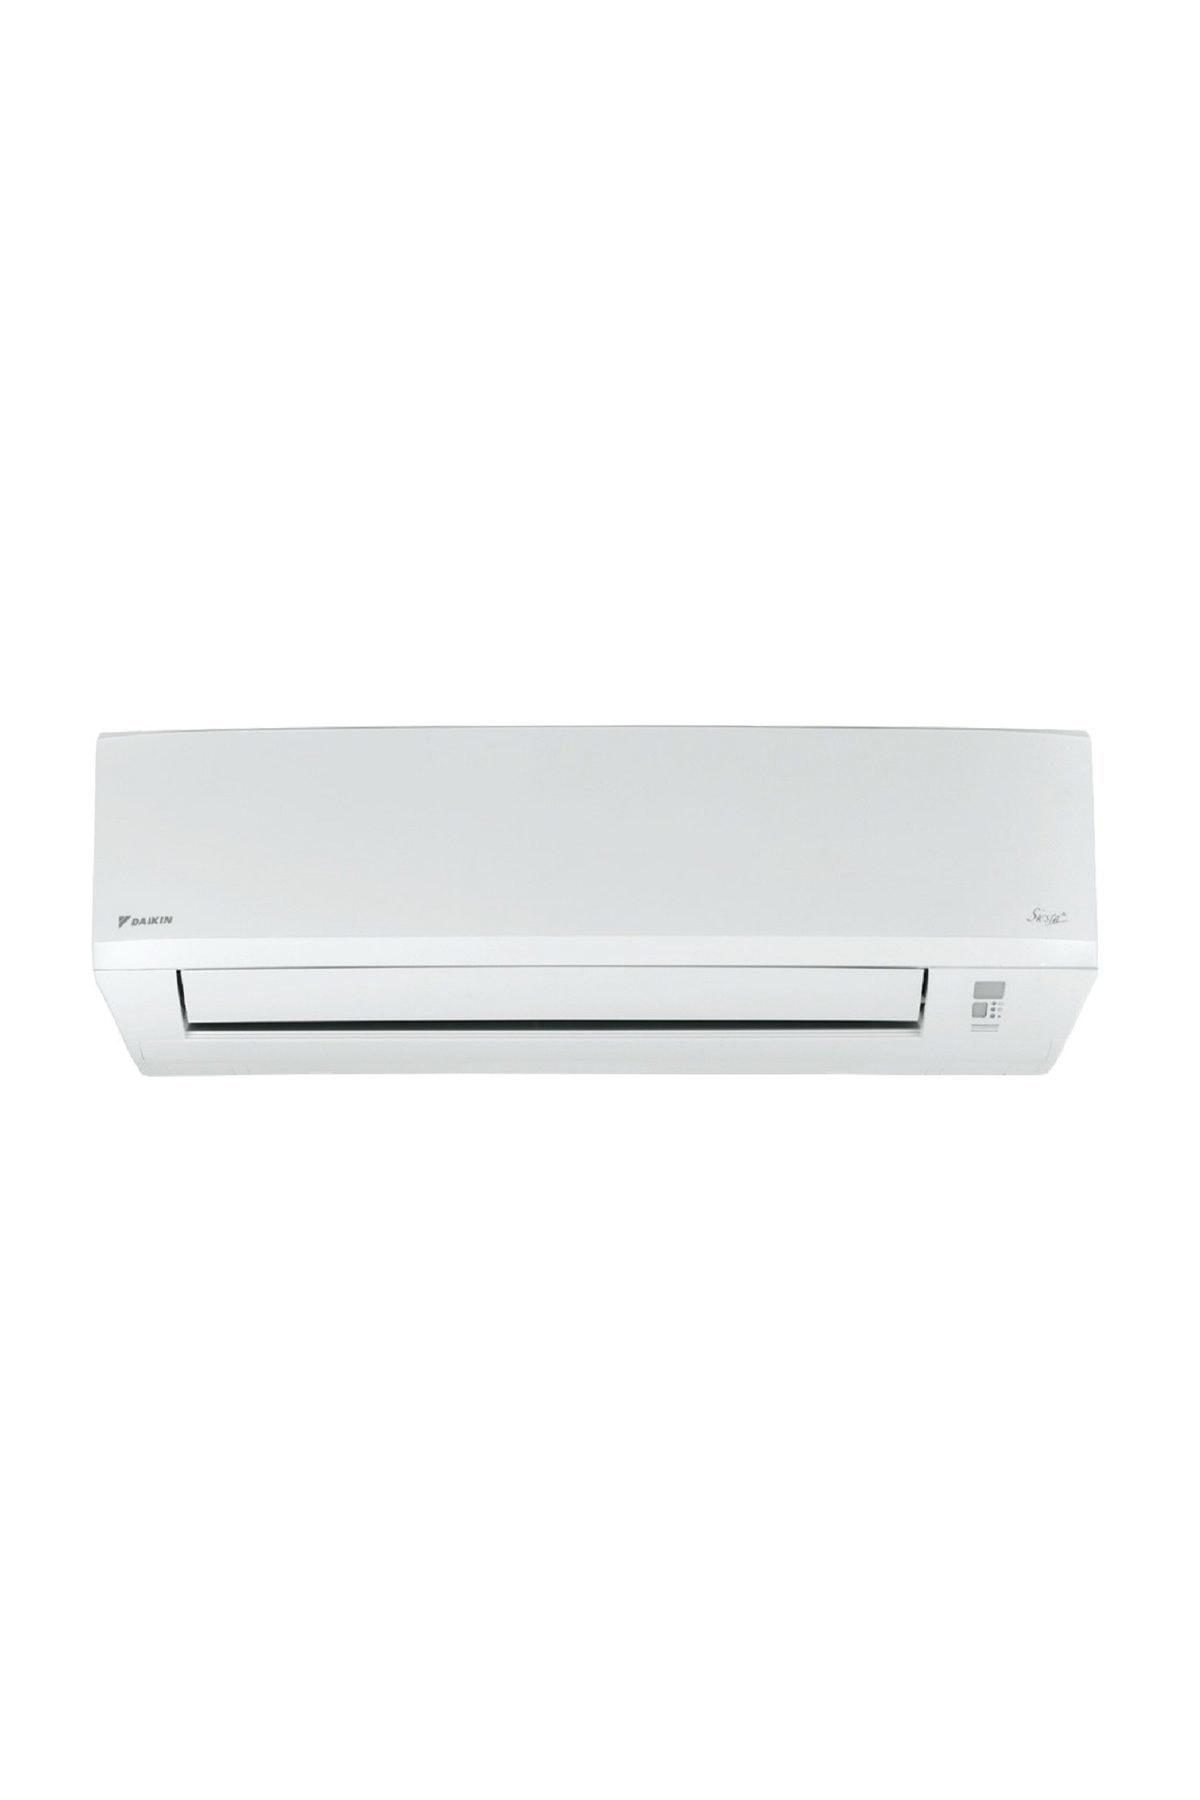 N Serisi ATXN60NB7 A+ 21300 BTU Inverter Klima